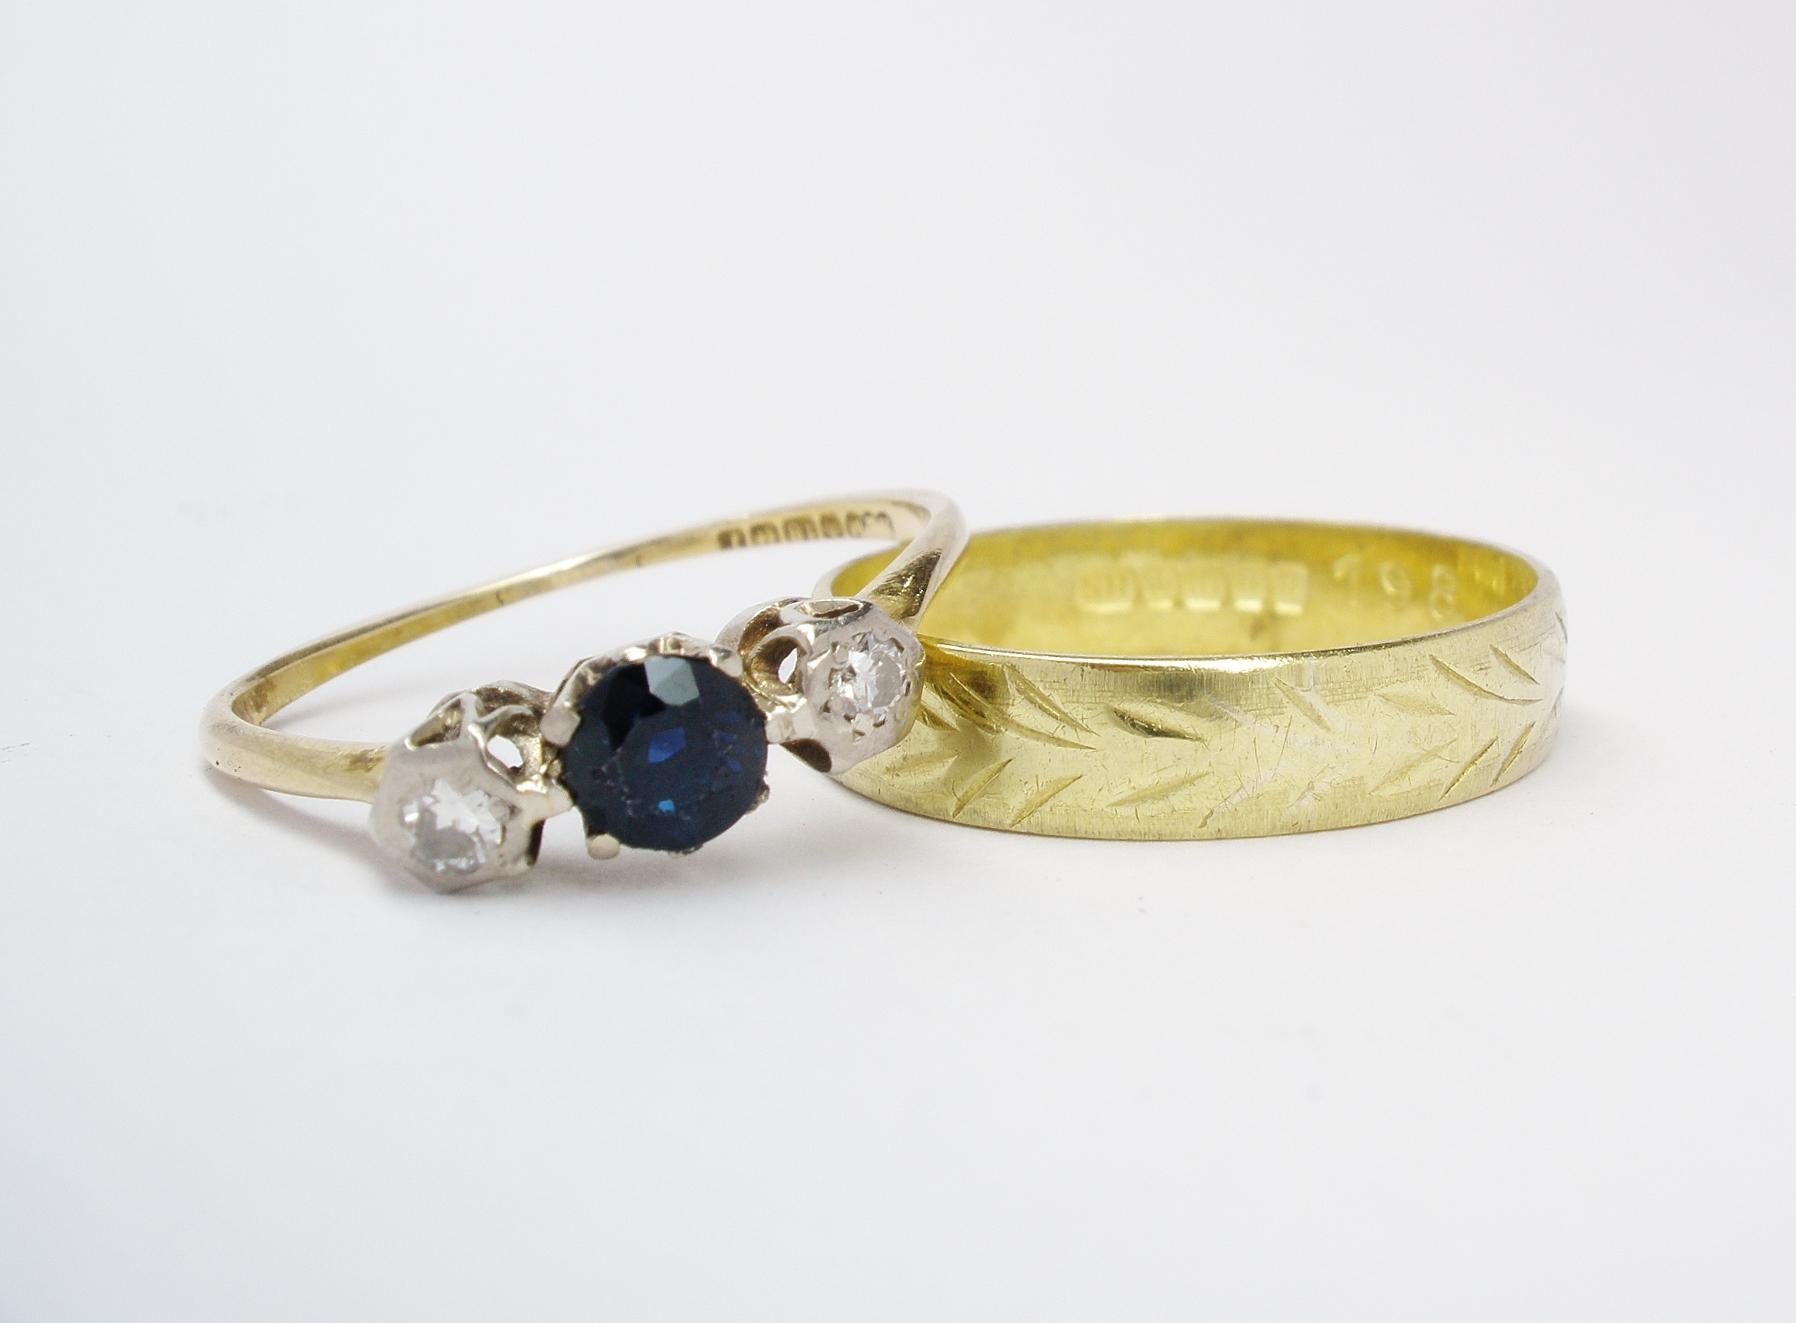 Deceased mother's engagement & wedding rings